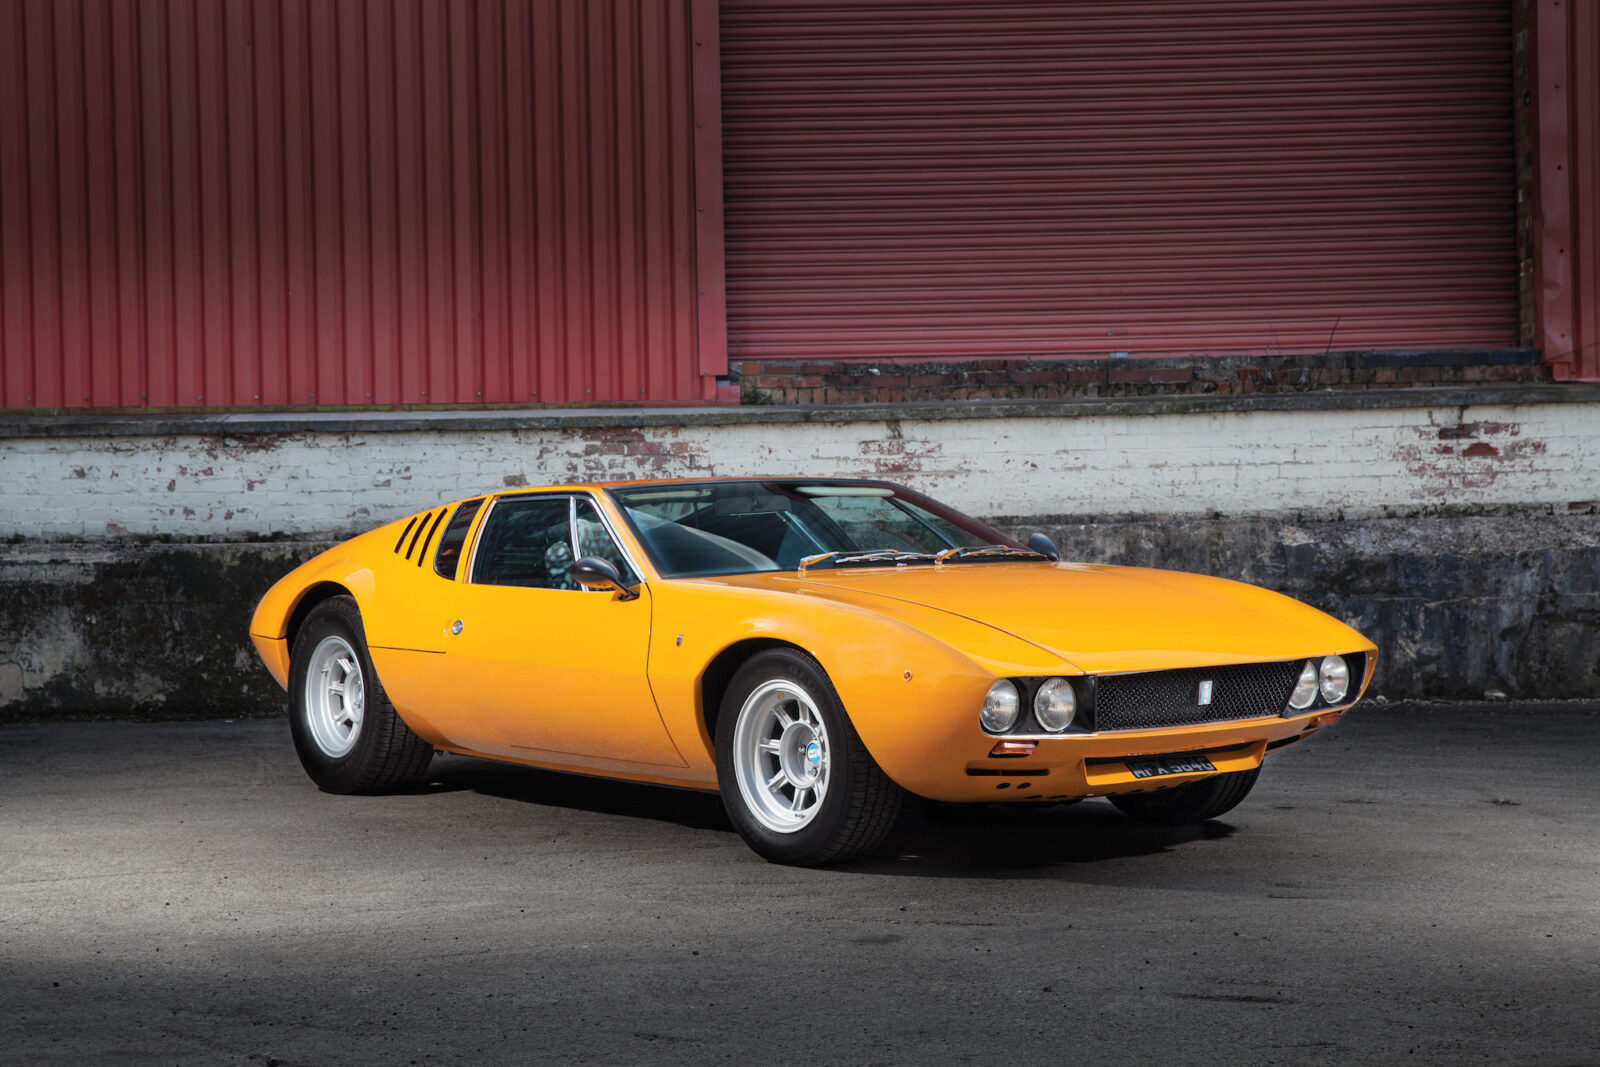 An Original 1969 De Tomaso Mangusta